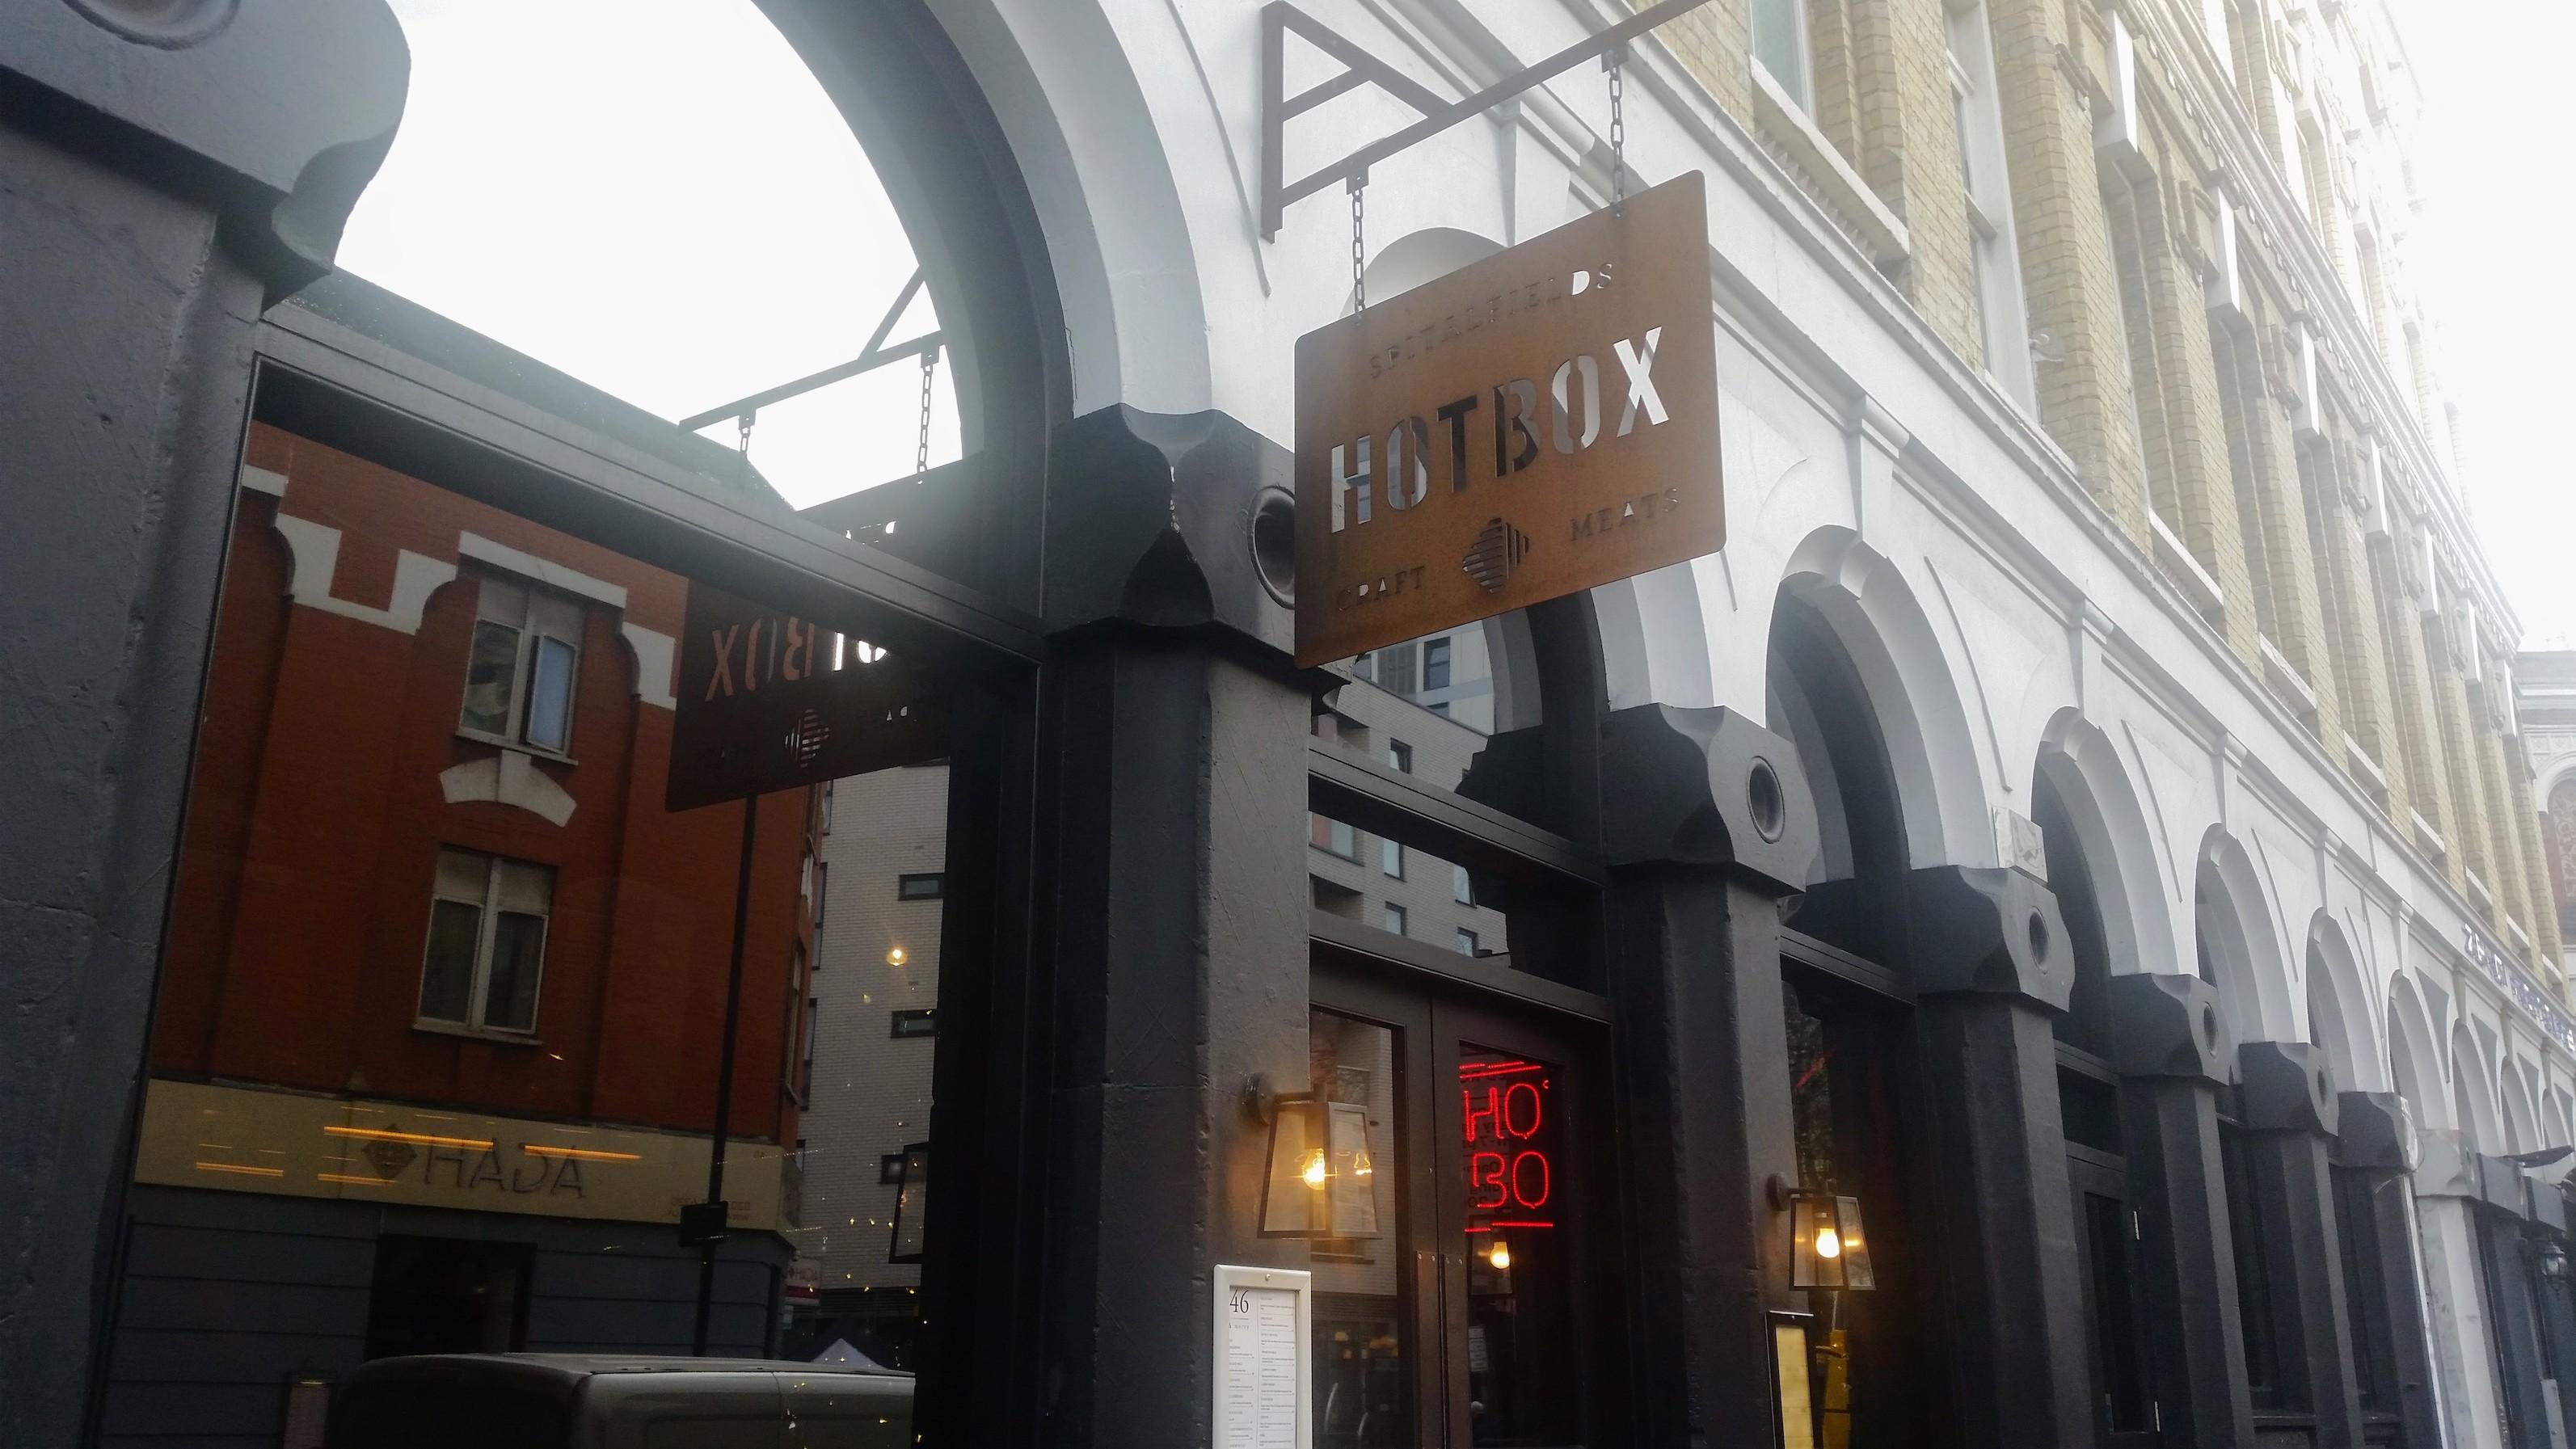 hotbox-spitalfield-01